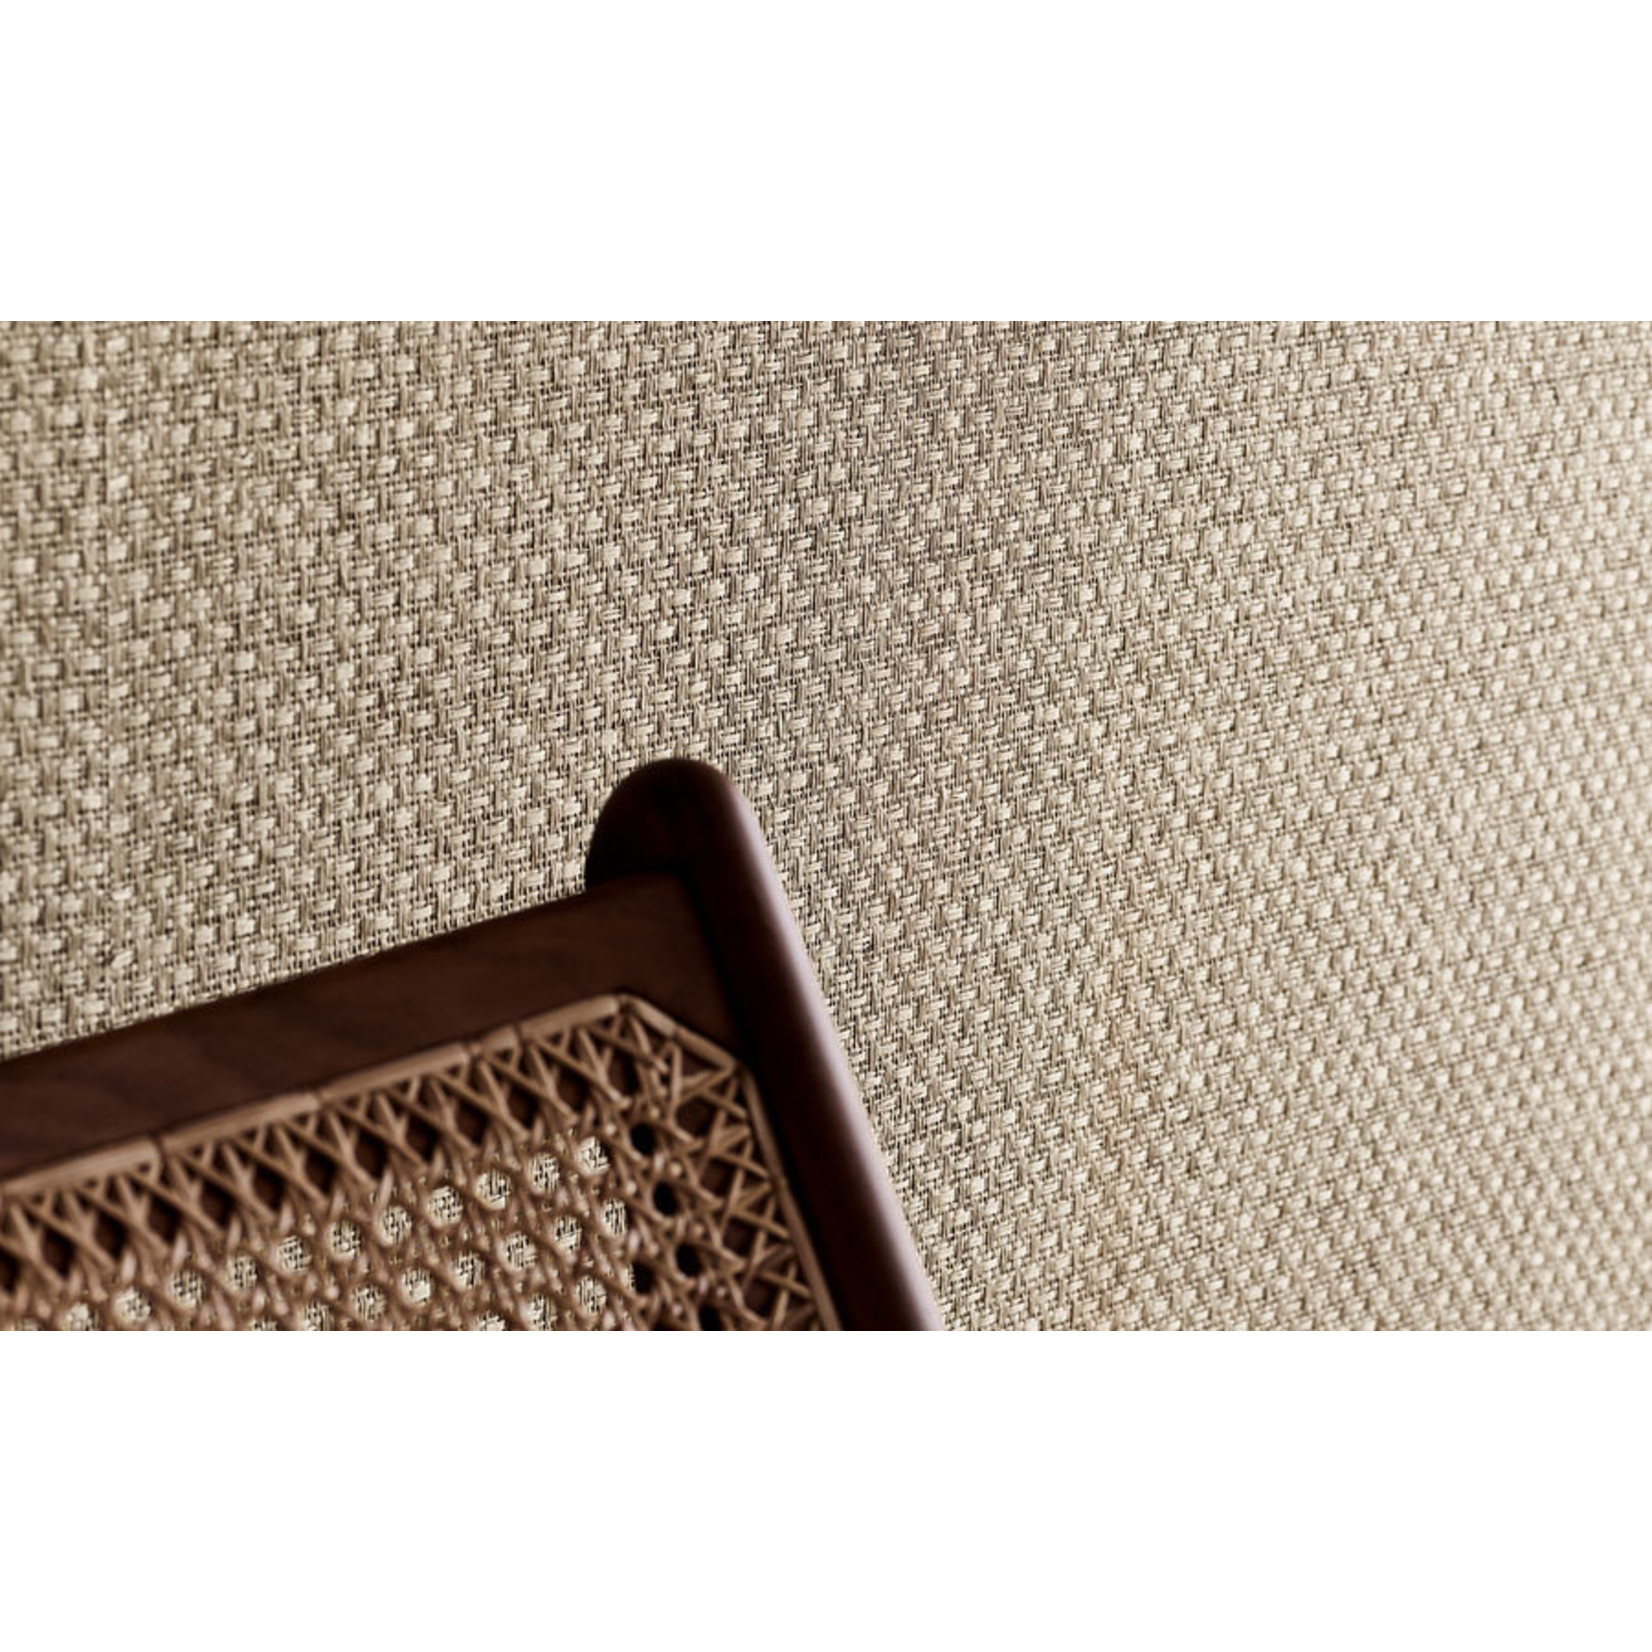 Mark Alexander Paperweave Handwoven Wallcoverings | Shifu Metal